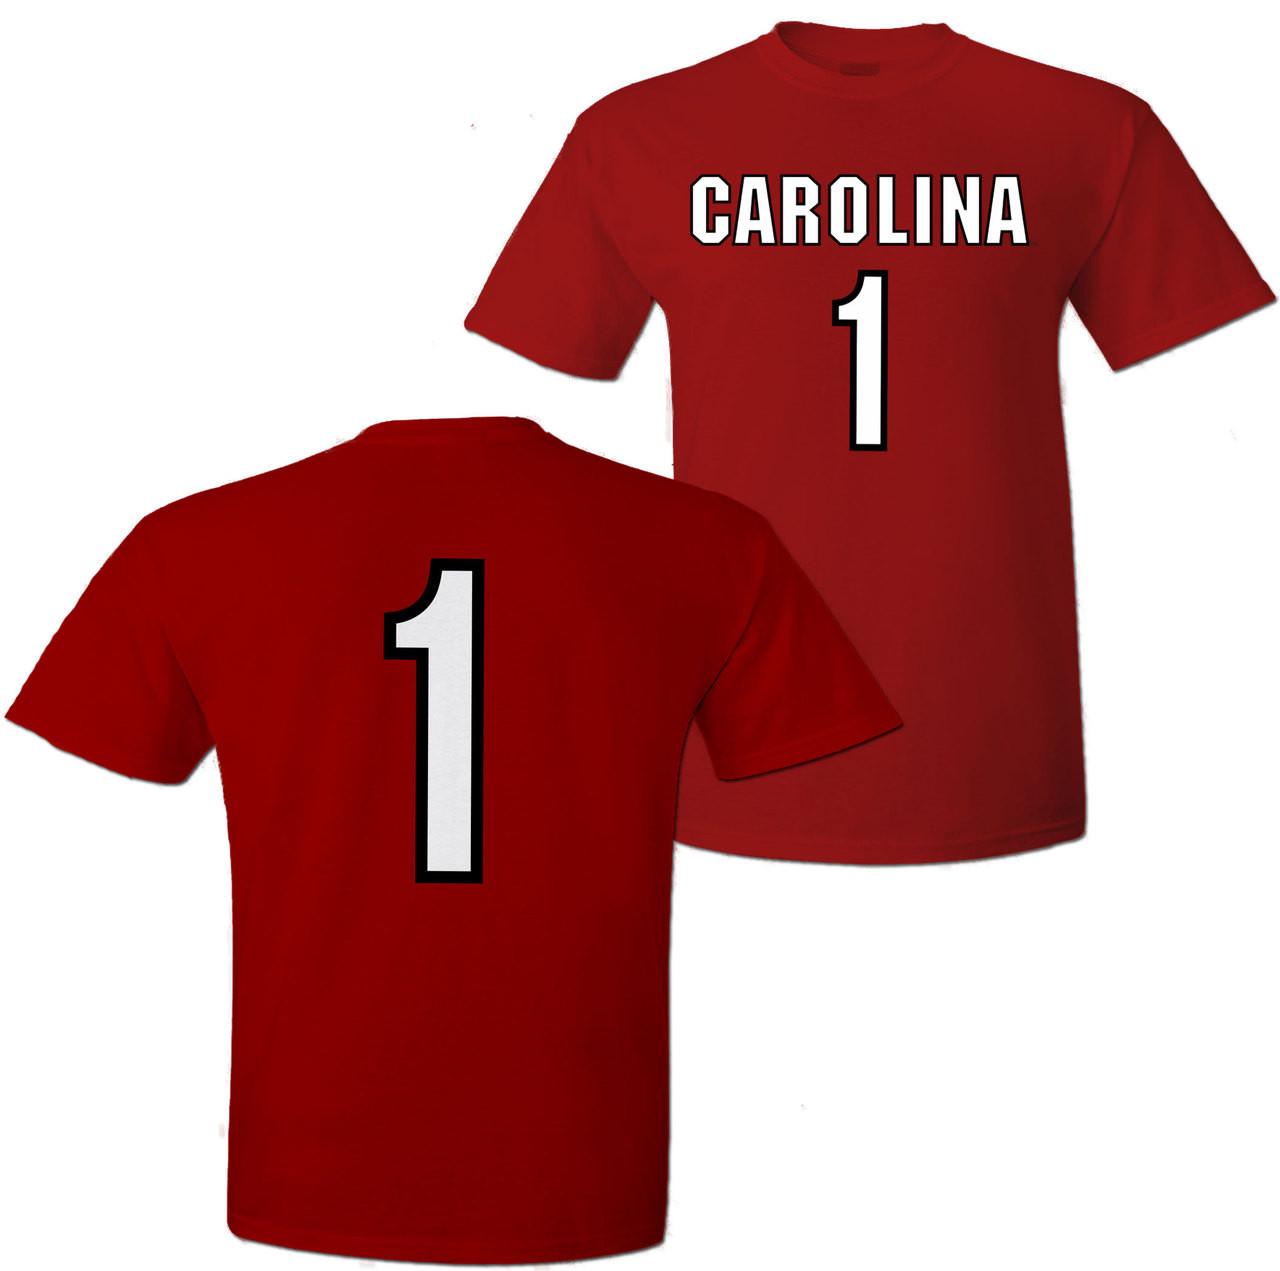 the best attitude 14ad6 e0568 South Carolina Gamecock Jersey T-shirt #1